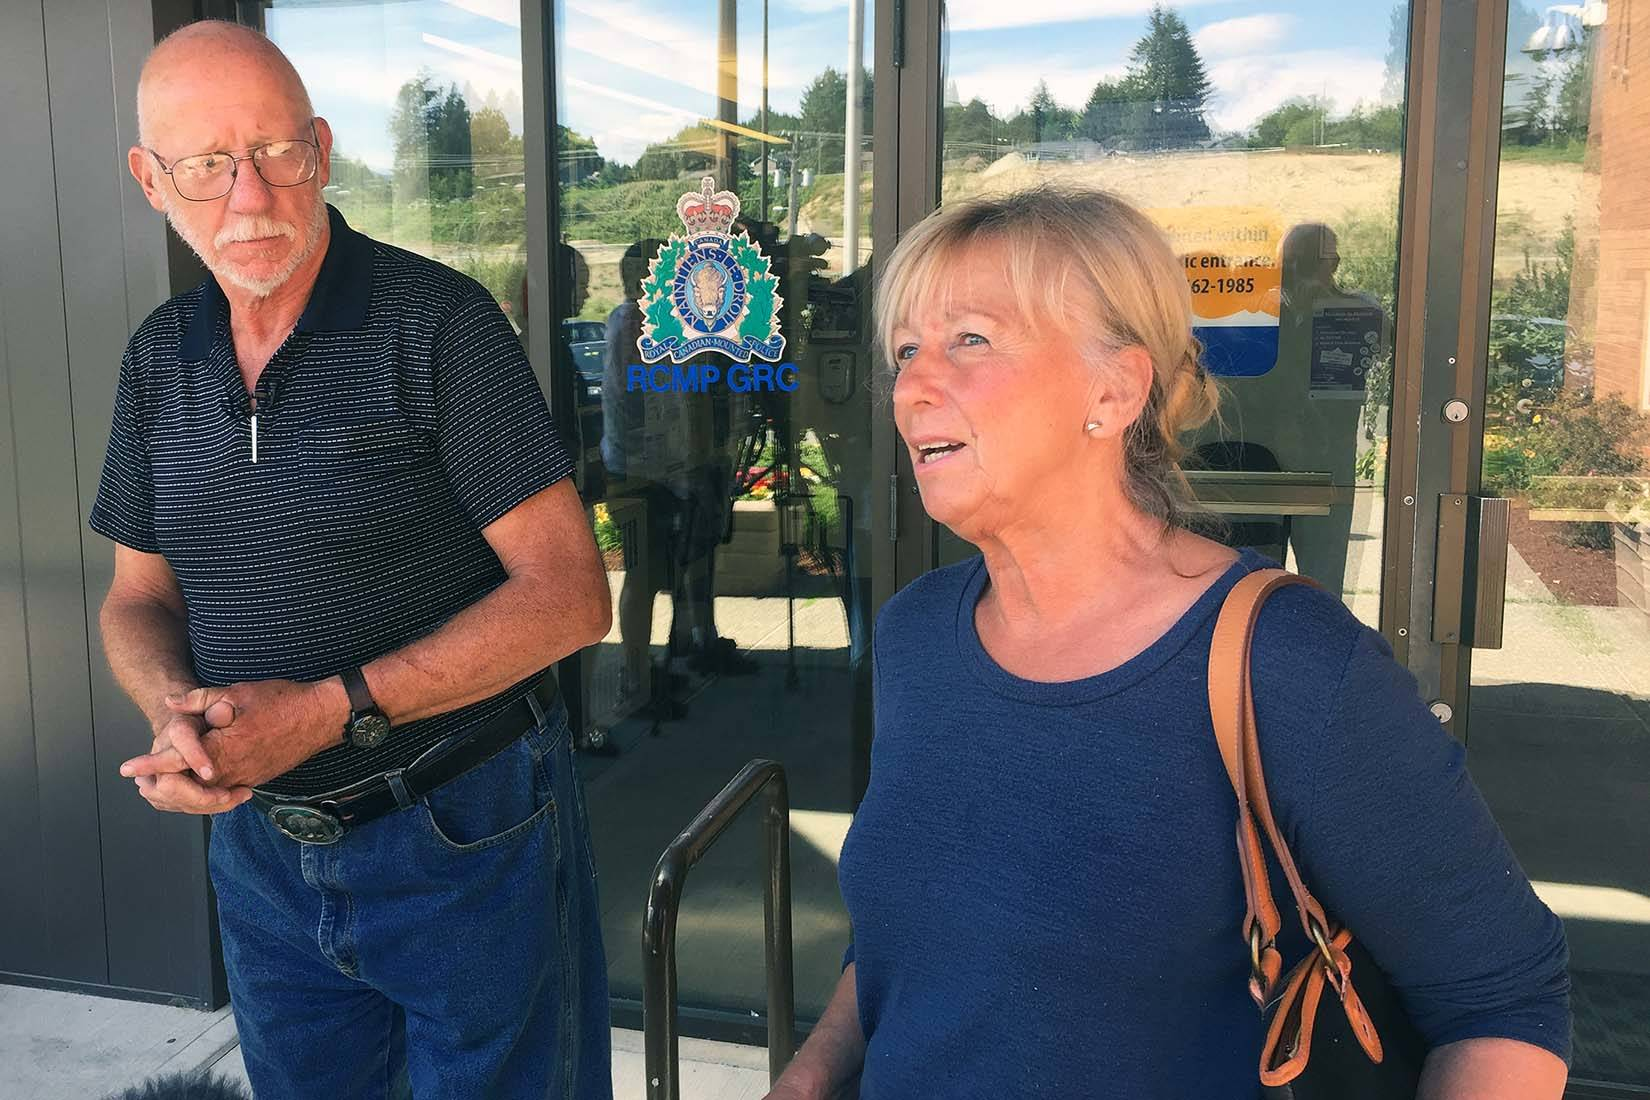 Parents of B.C. murder victim want her personal belongings back